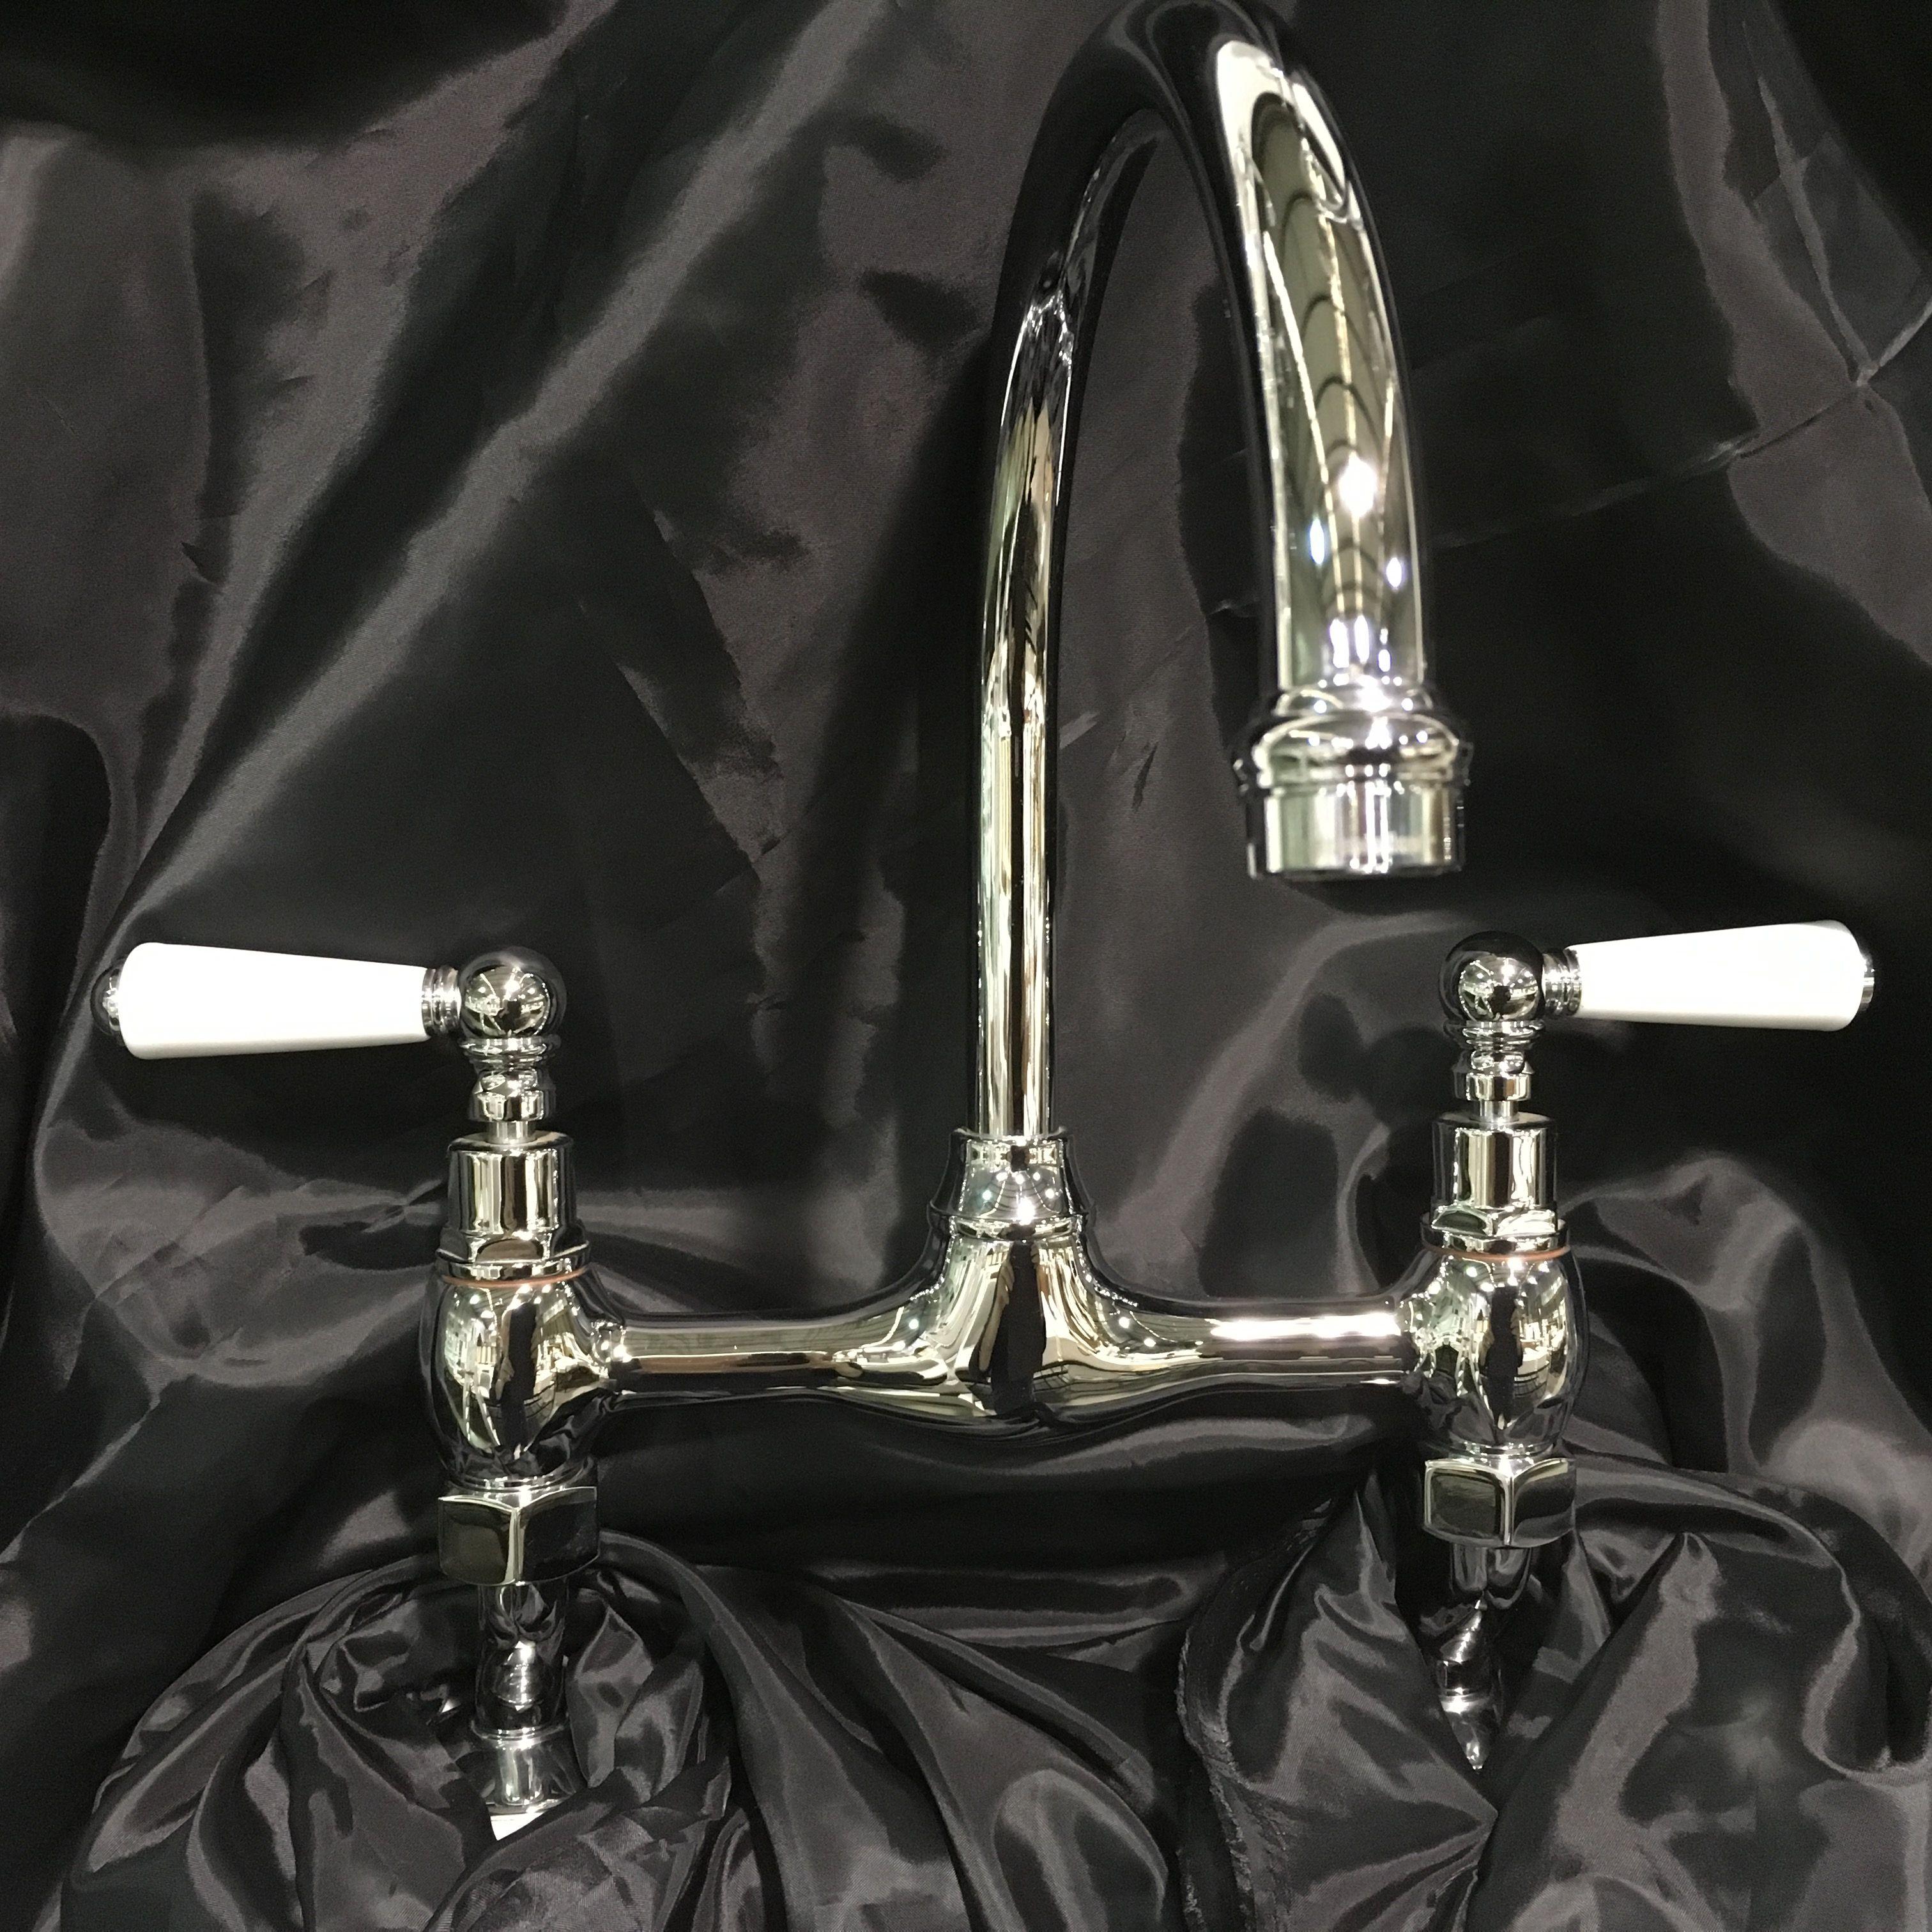 The AstraWalker range of bathroom and kitchen heritage ...